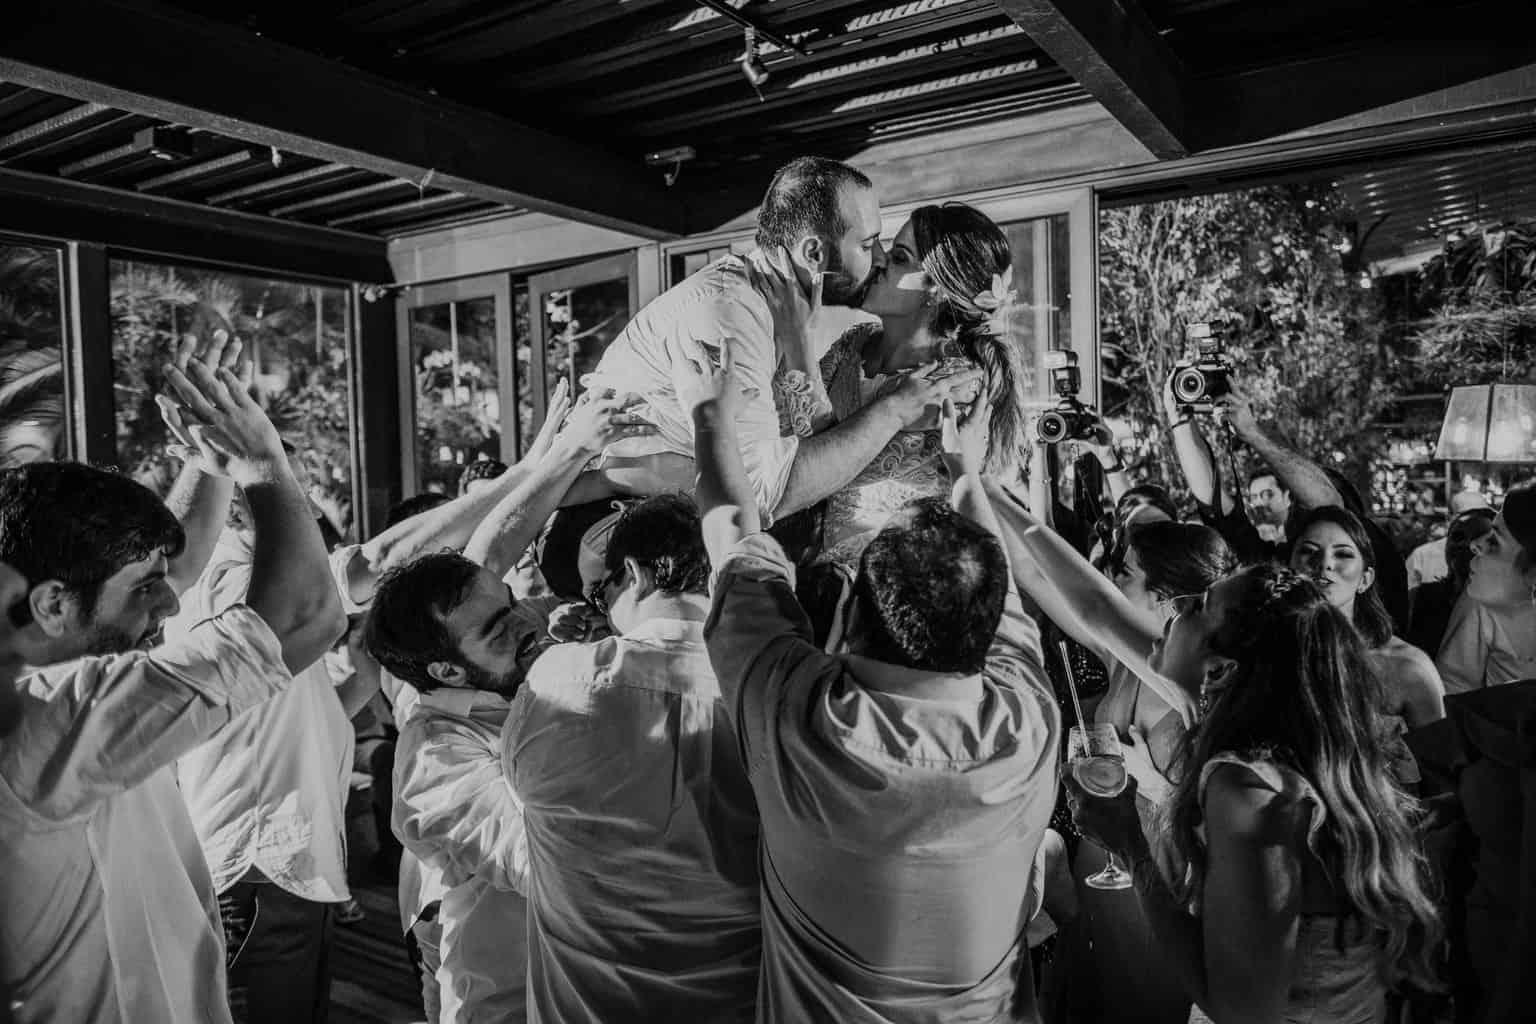 casamento-na-serra-festa-de-casamento-Fotografia-Renata-Xavier-Les-Amies-Cerimonial-Locanda-Della-Mimosa-Natalia-e-Bruno-noivos-na-pista705-1